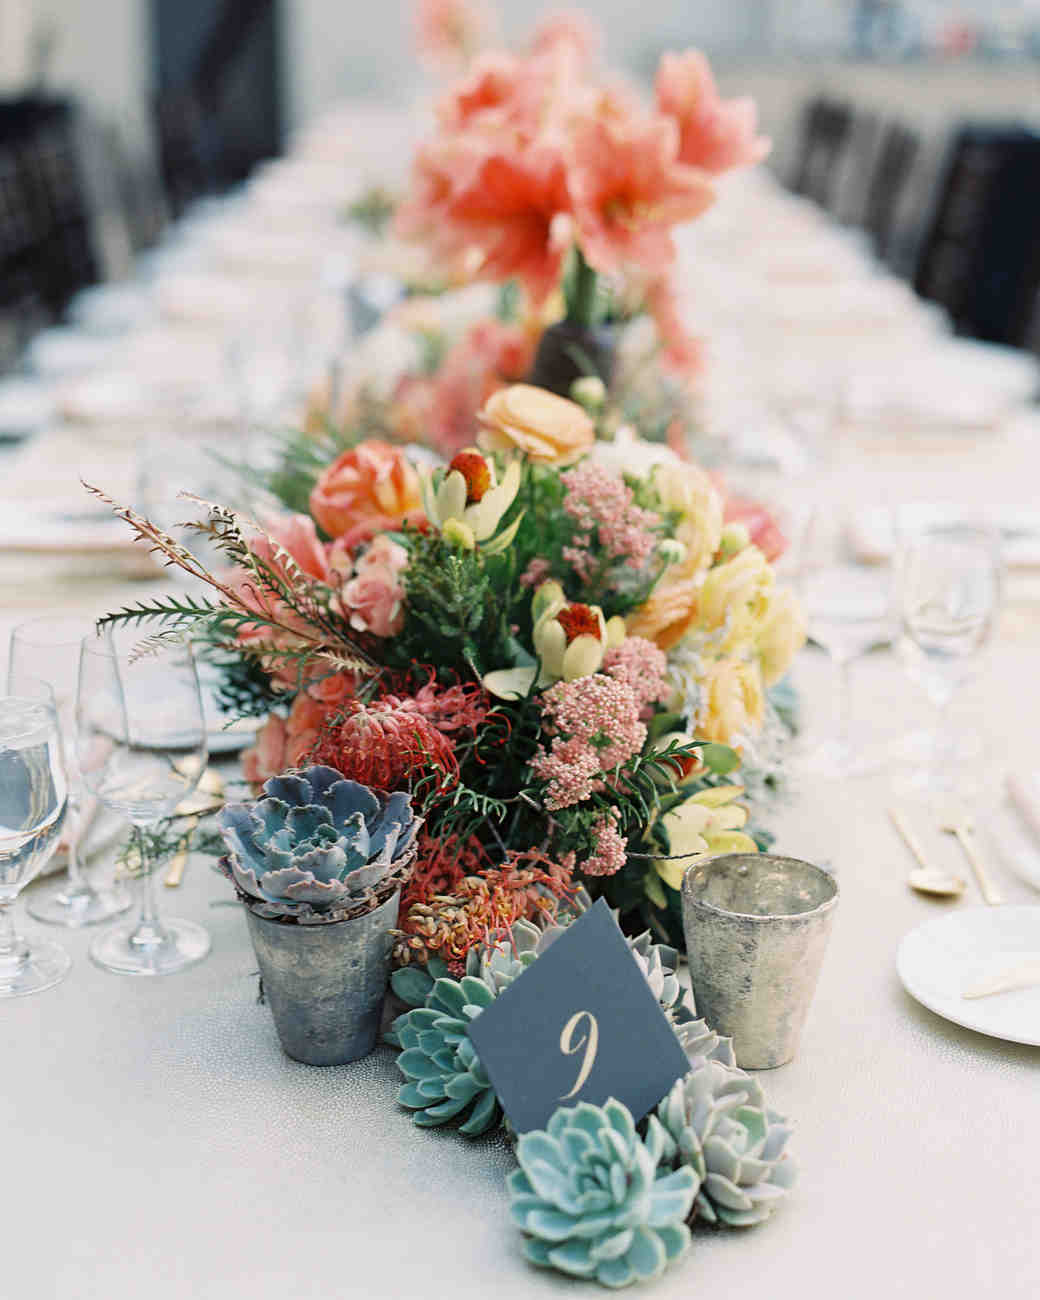 Sustainable Wedding Ideas: Succulent Centerpiece